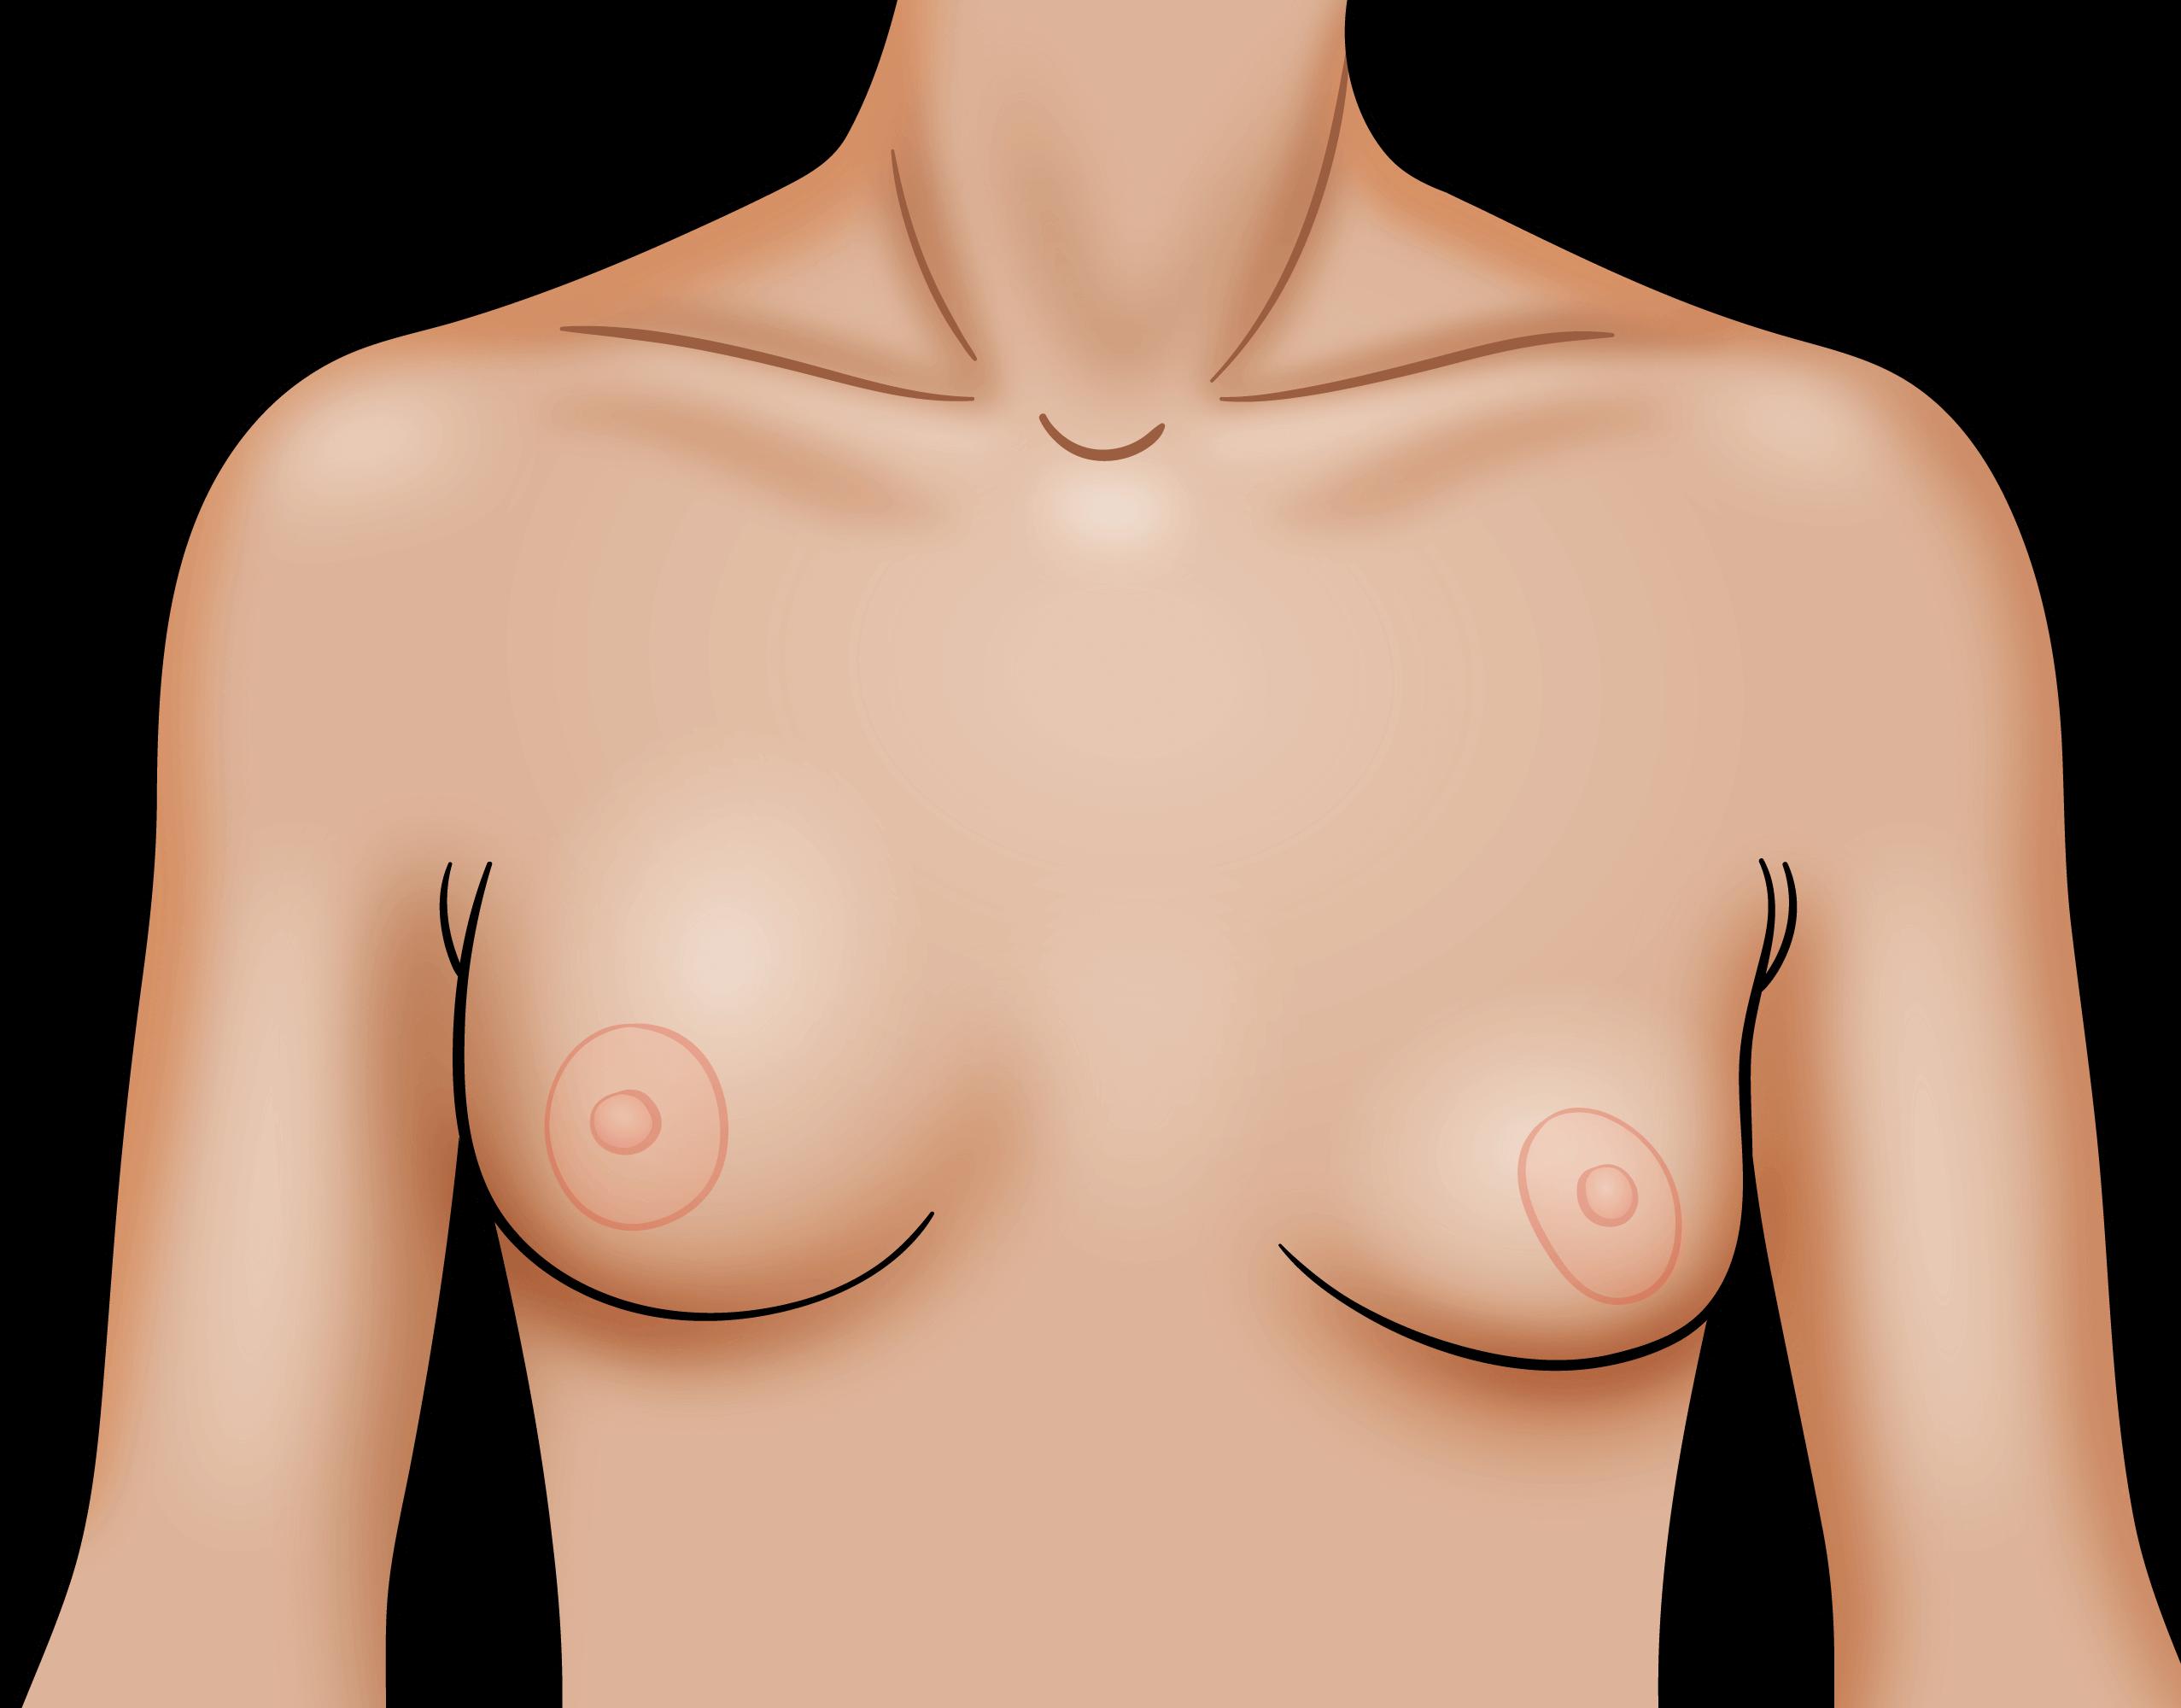 Saline Breast Implant Rupture Scottsdale Phoenix AZ